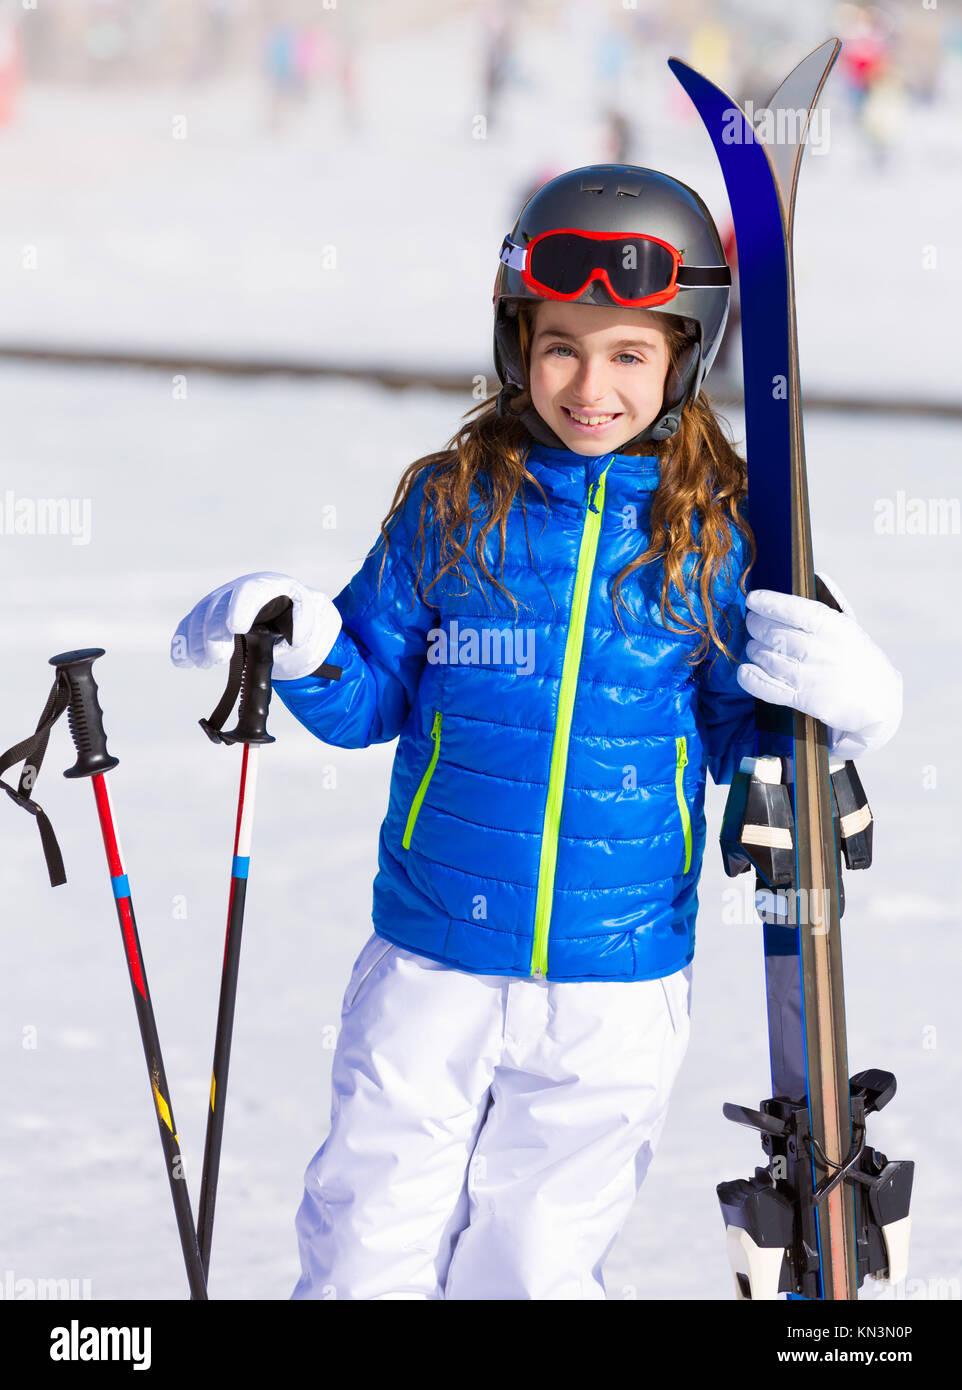 Kid girl winter snow with ski equipment helmet goggles poles. - Stock Image